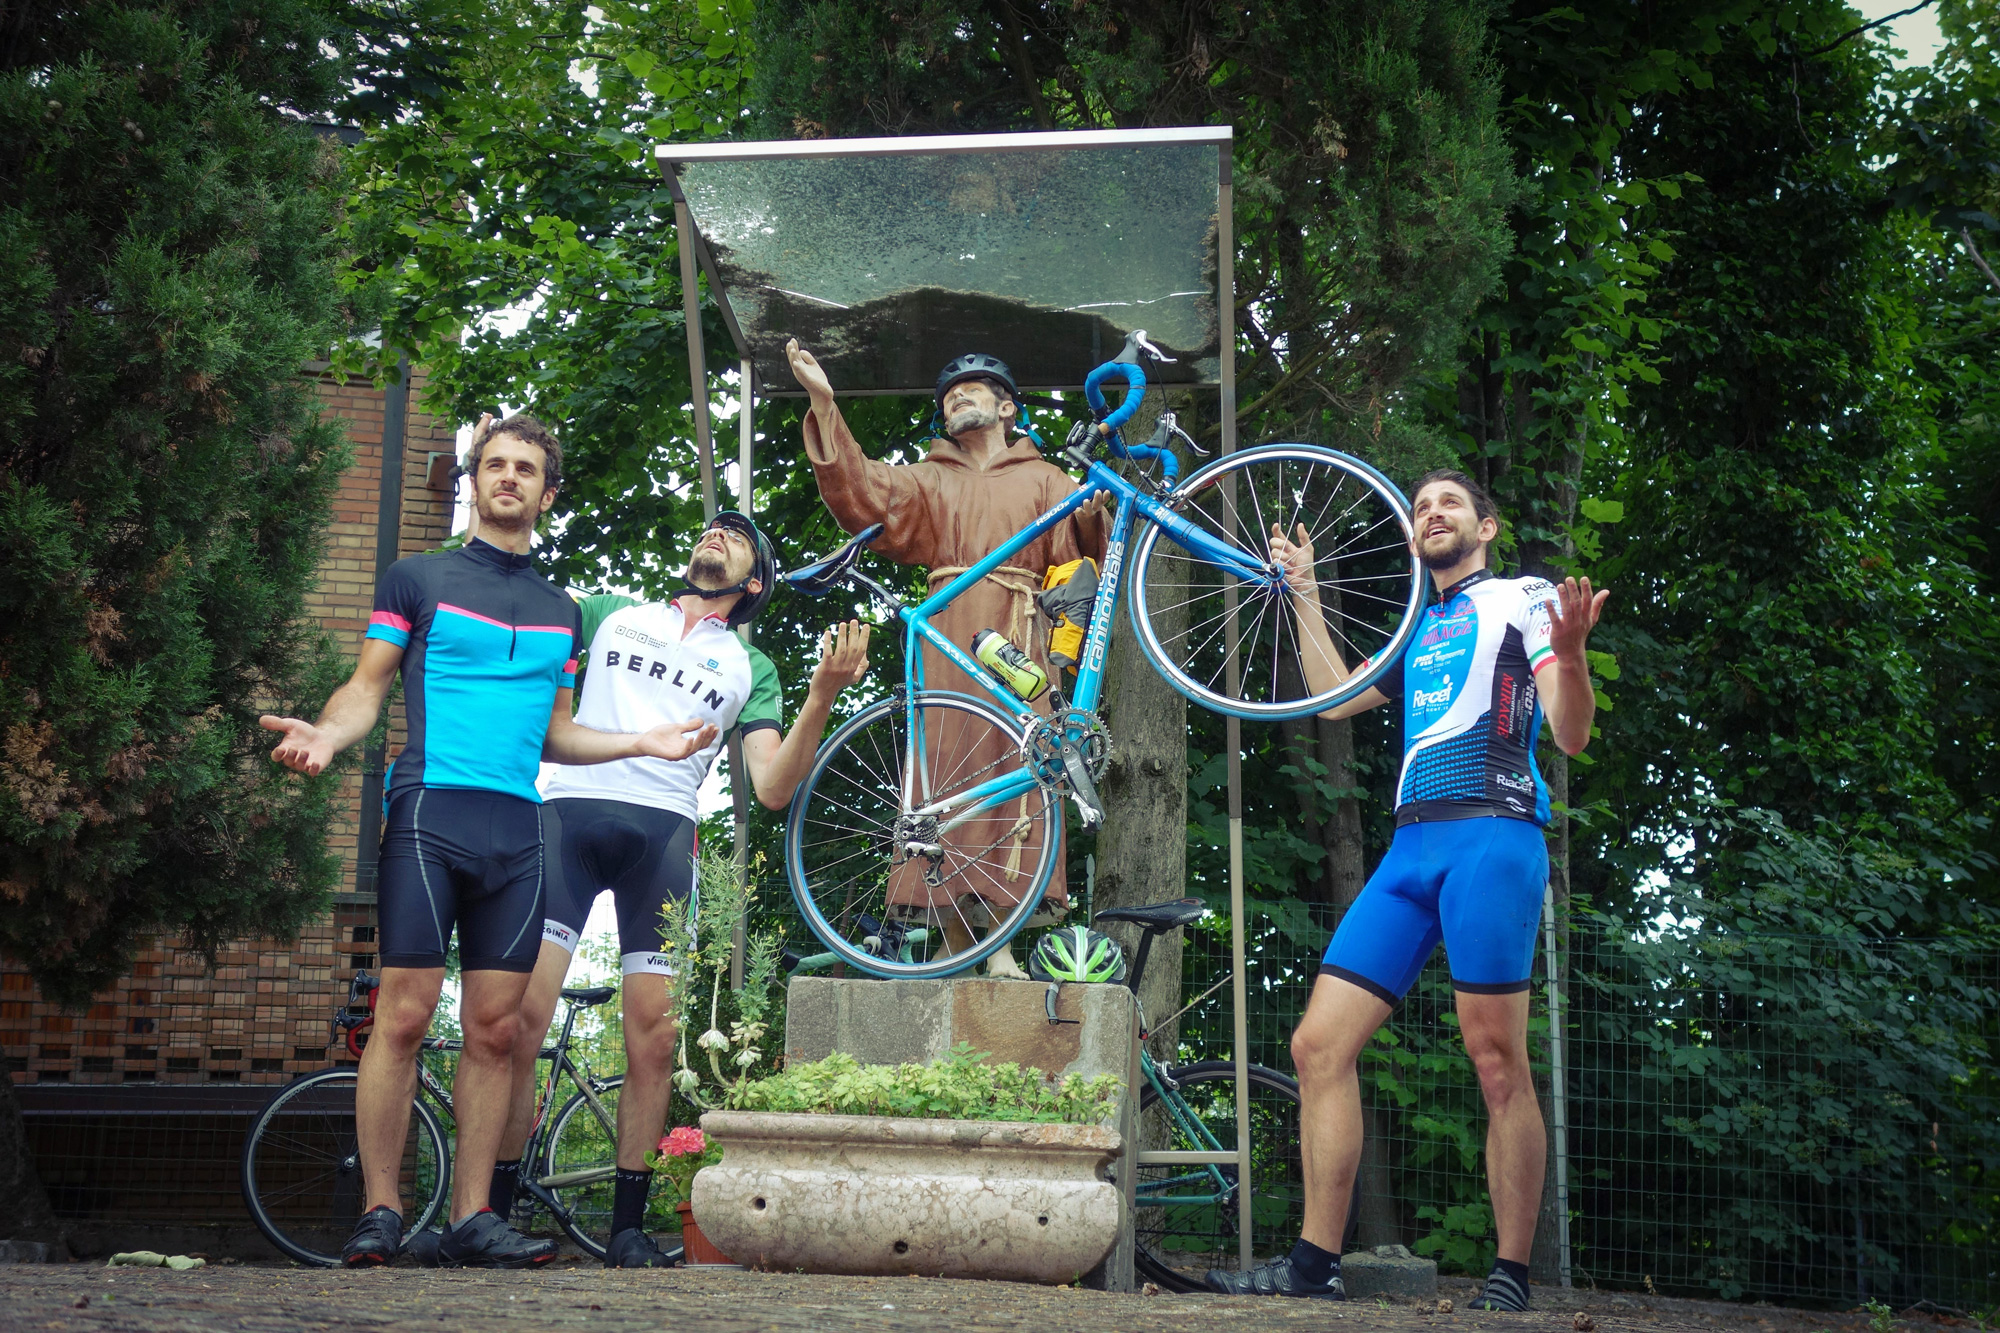 erman.bike_sunset_ride_8_san_francesco-DSC07646-3